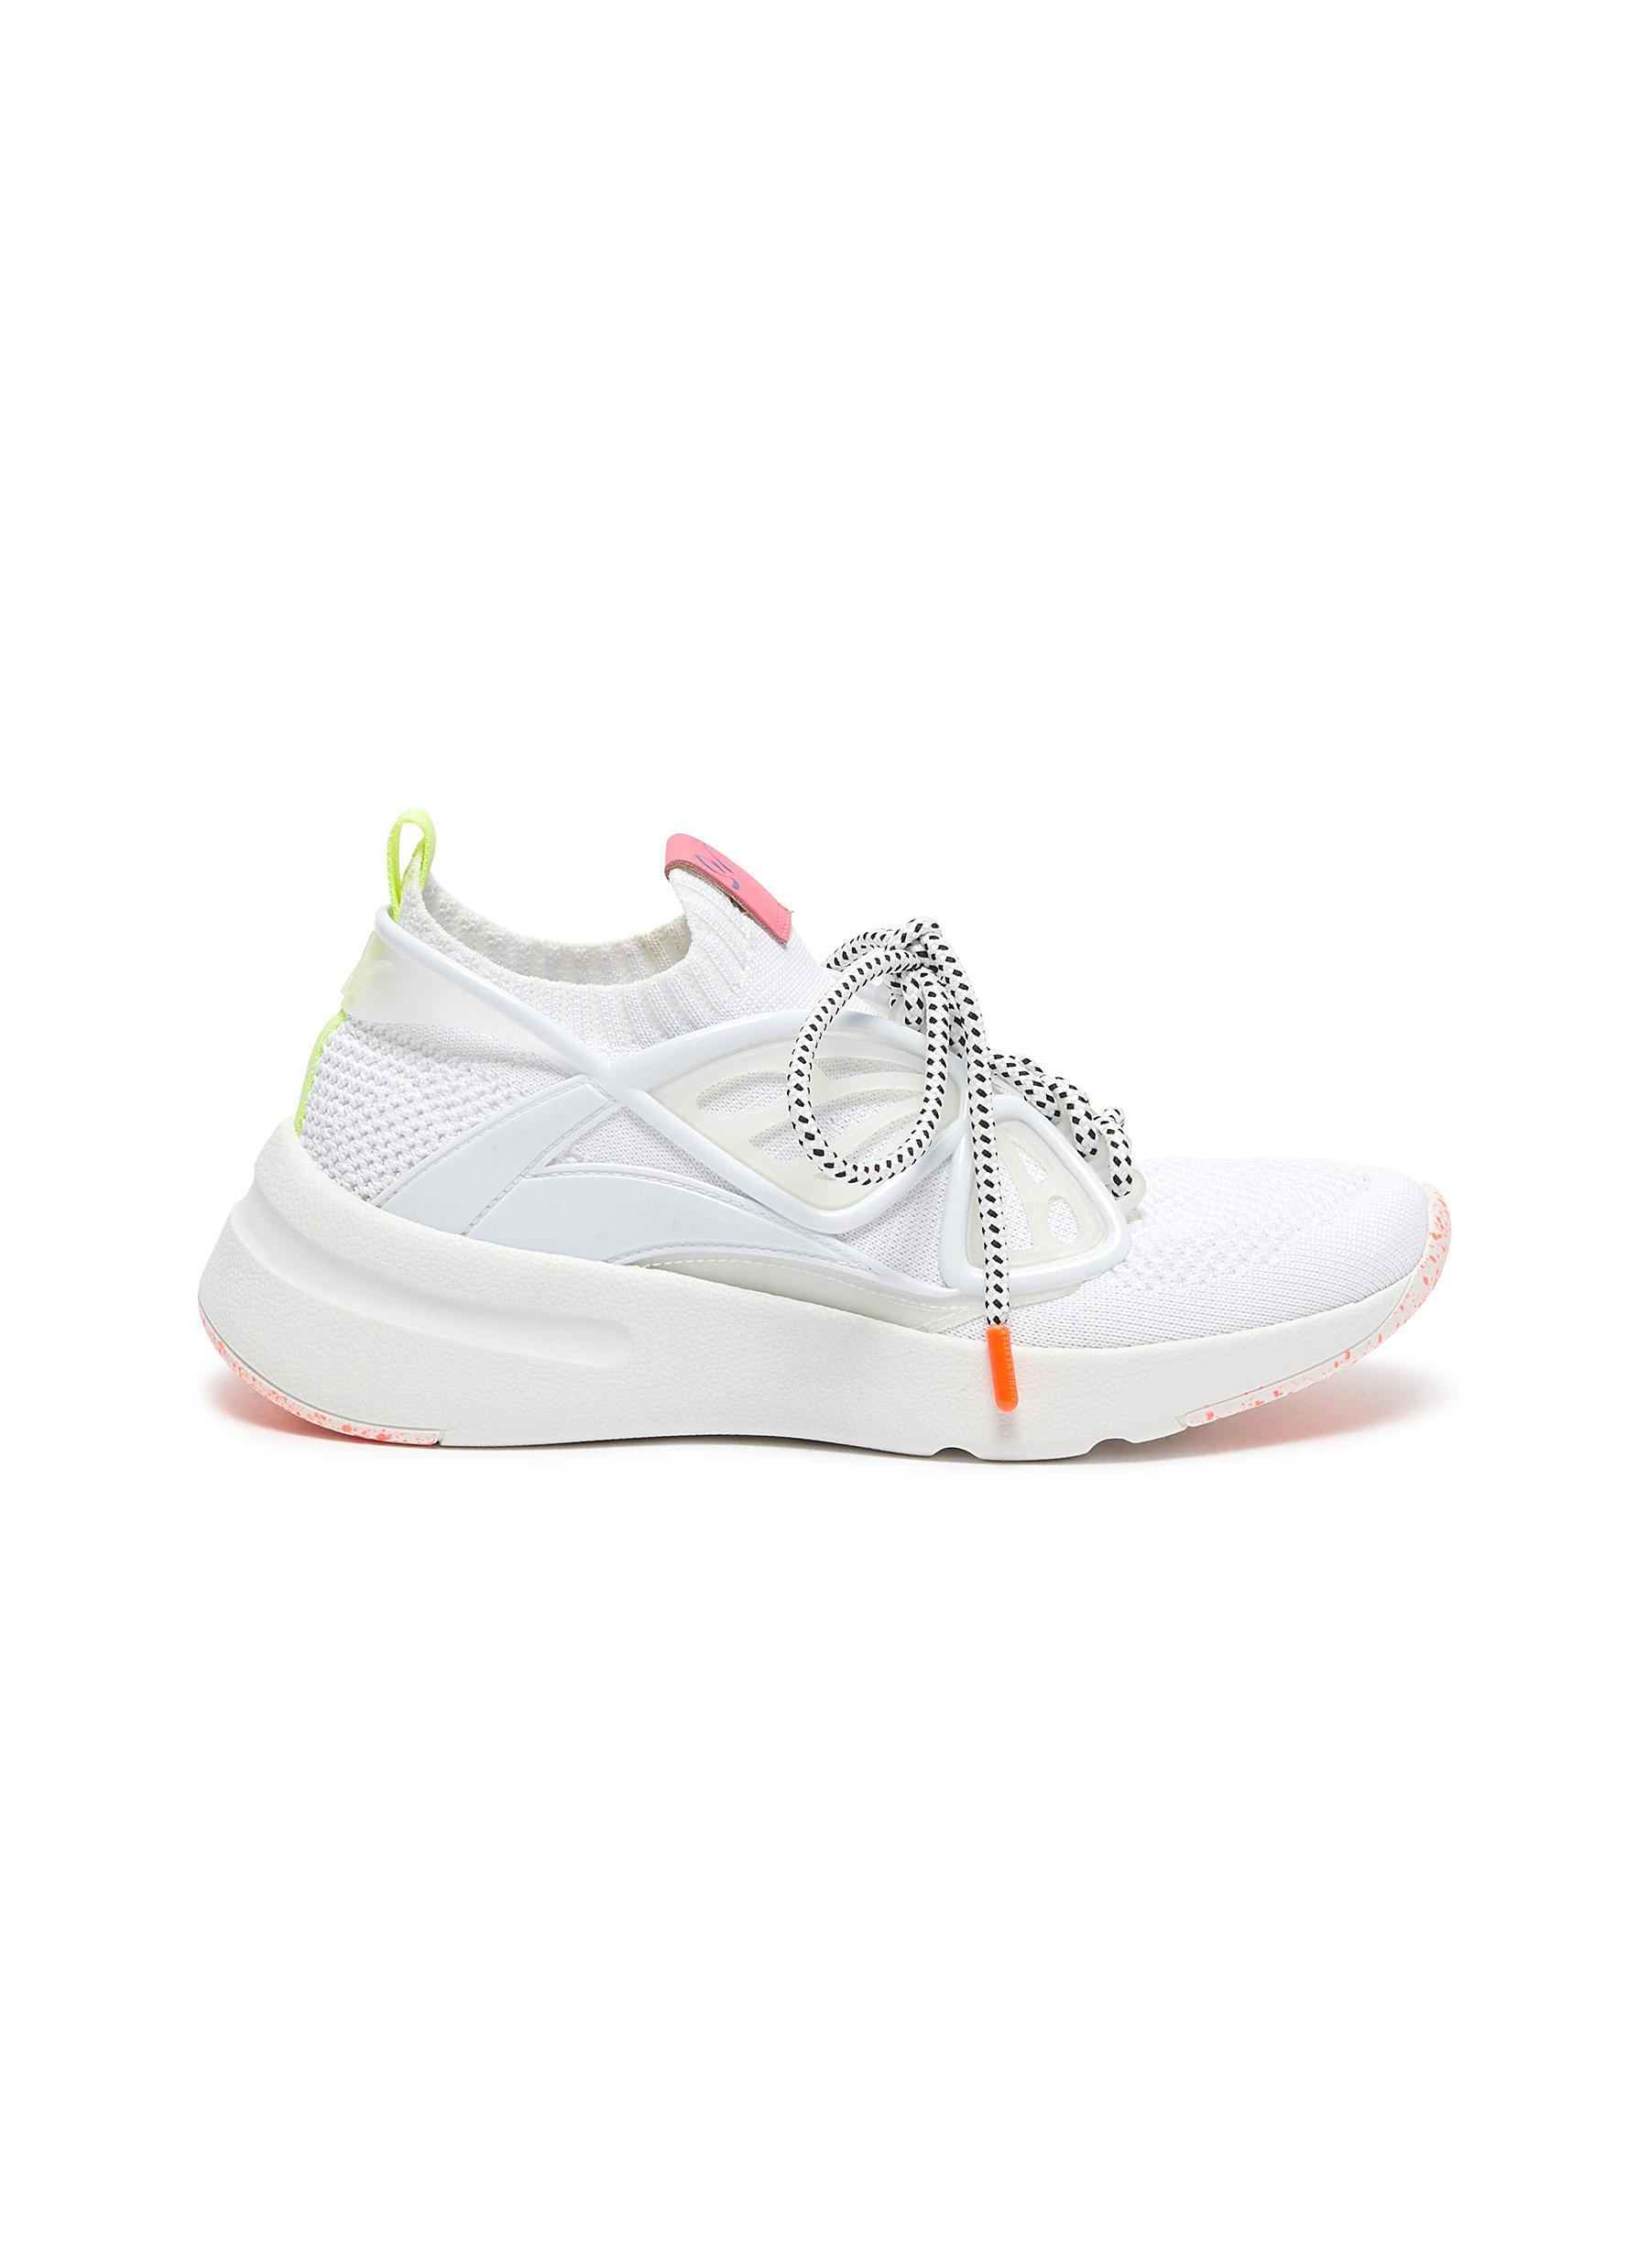 Sophia Webster Sneakers Fly By butterfly embellished sneakers